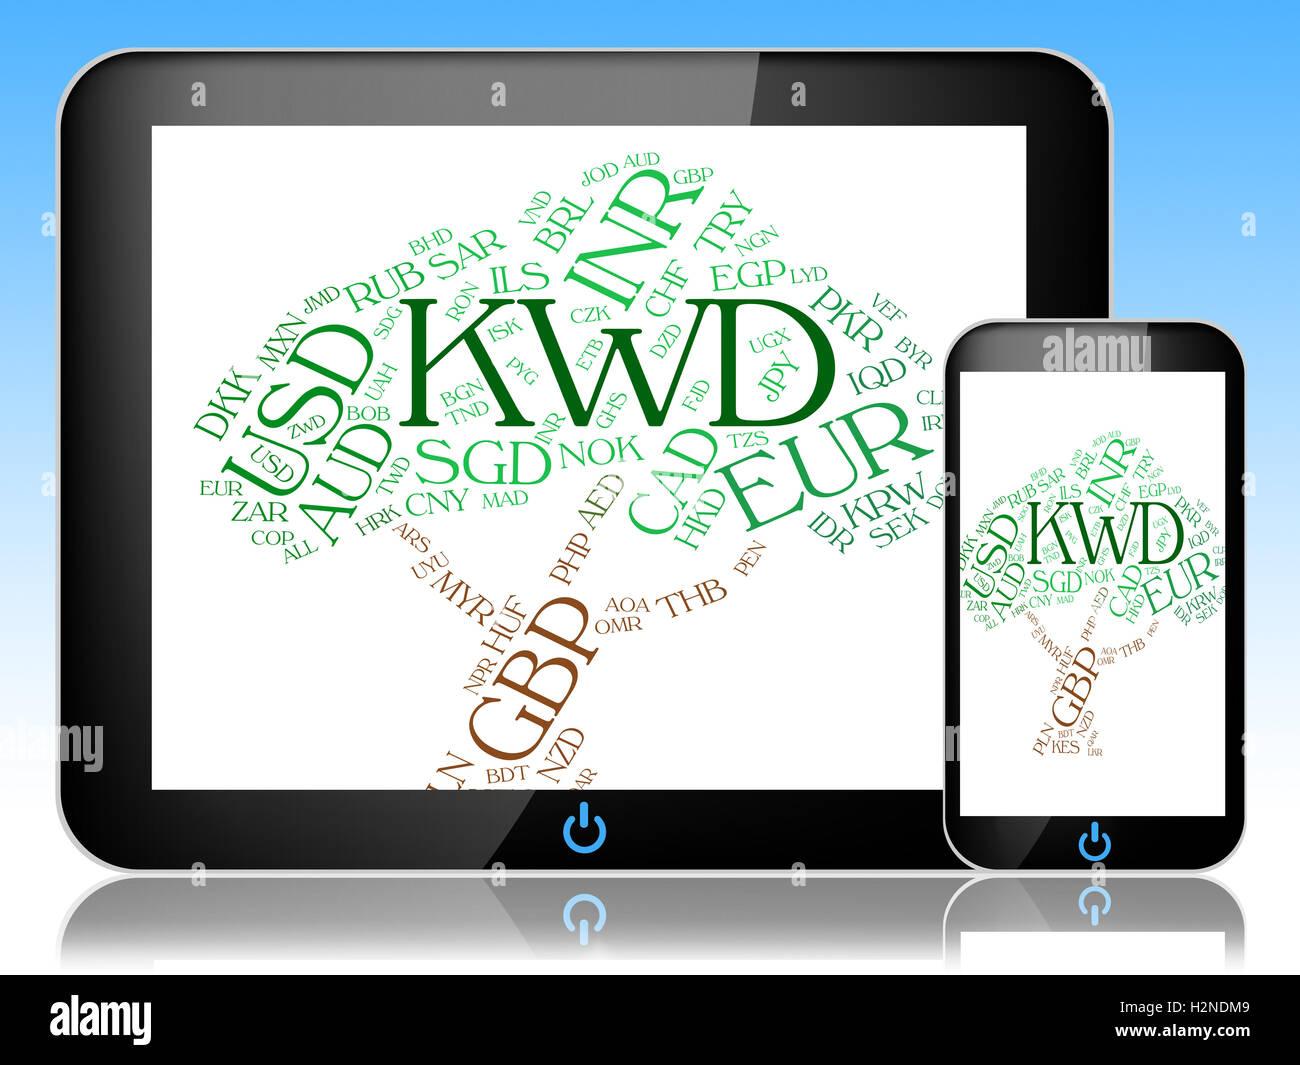 Kuwait forex companies